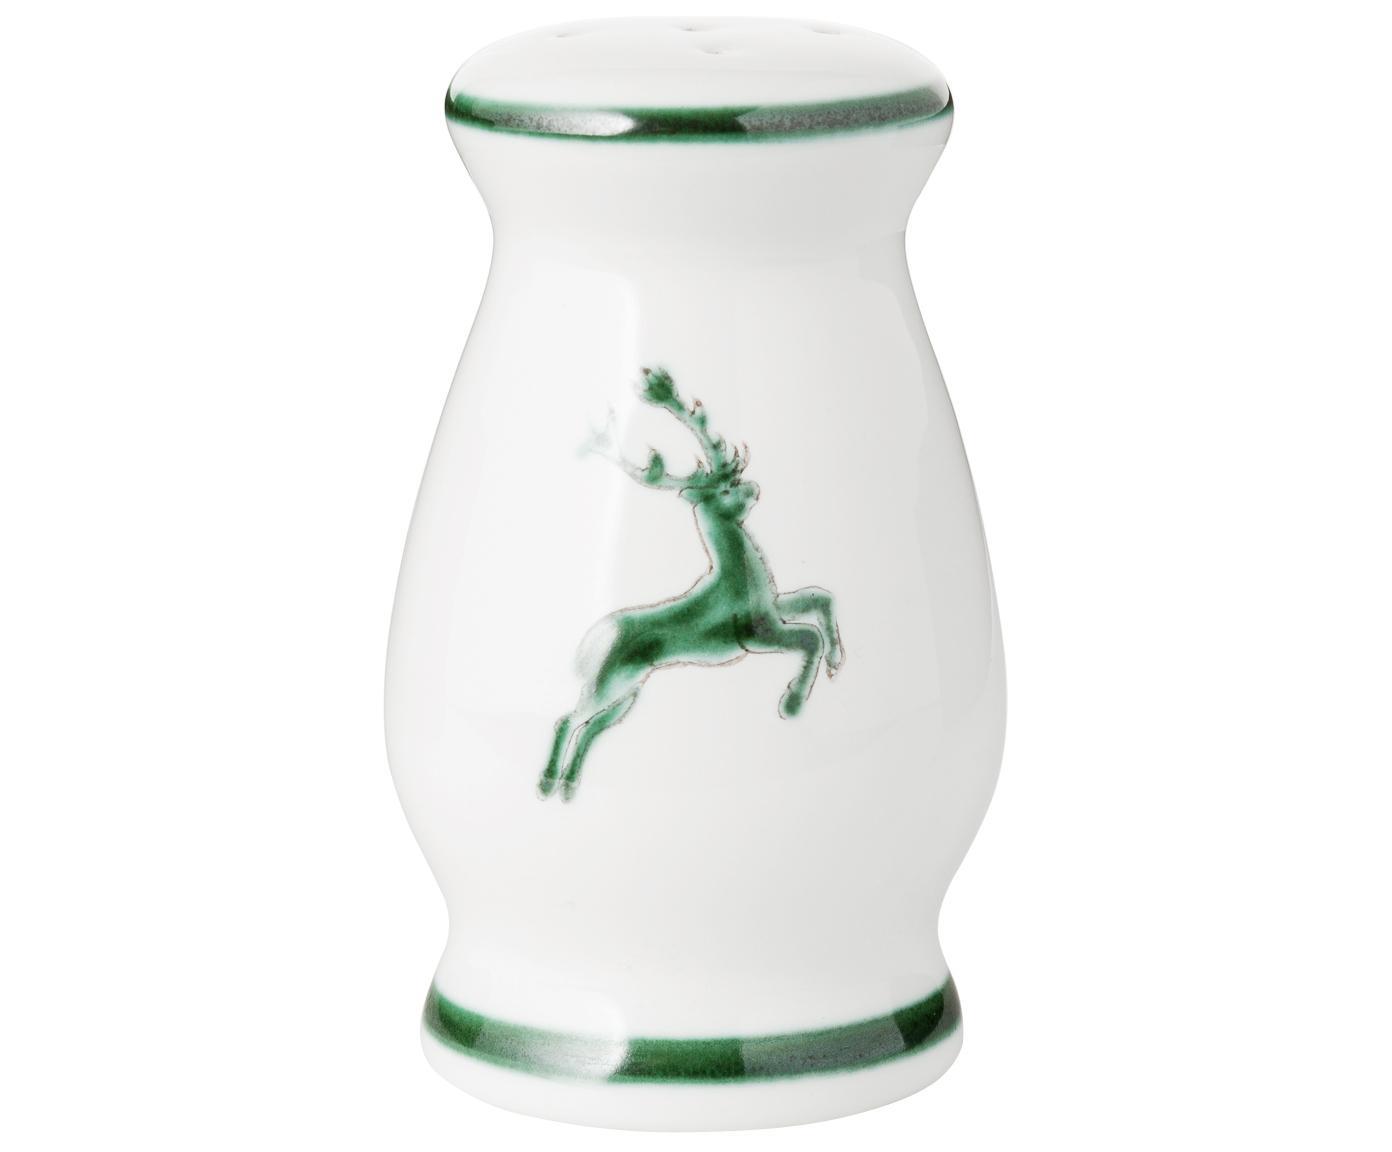 Salzstreuer Gourmet Grüner Hirsch, Keramik, Grün,Weiß, H: 9 cm